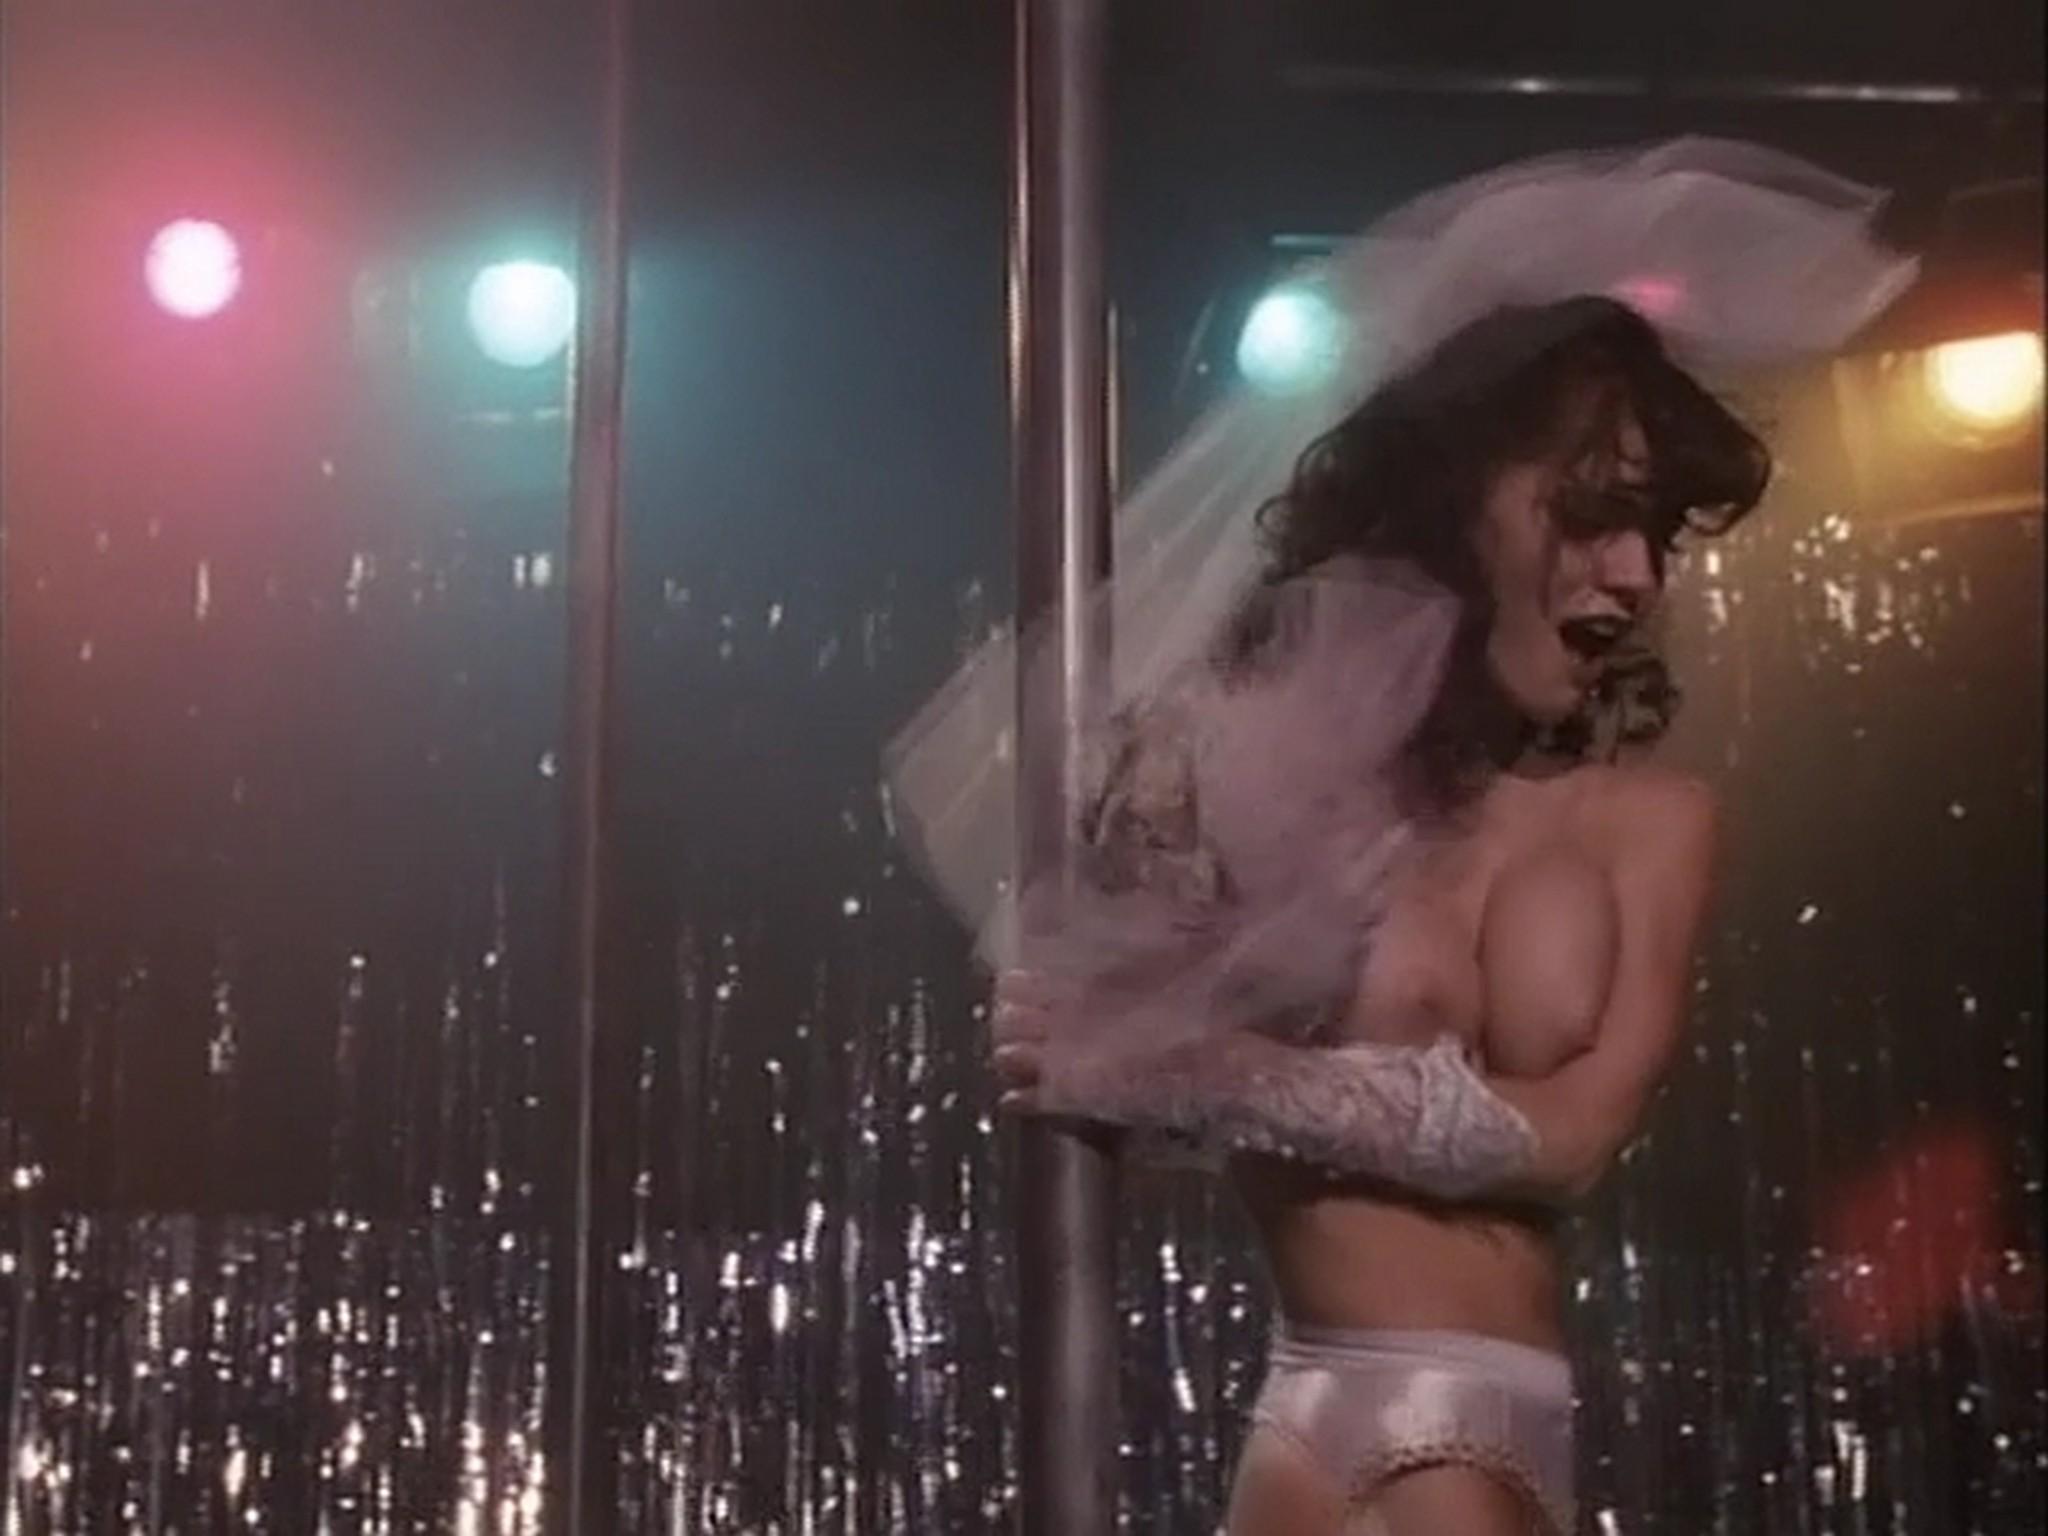 Barbara Alyn Woods nude Catya Sassoon Jill Pierce nude too as strippers Dance with Death 1991 5